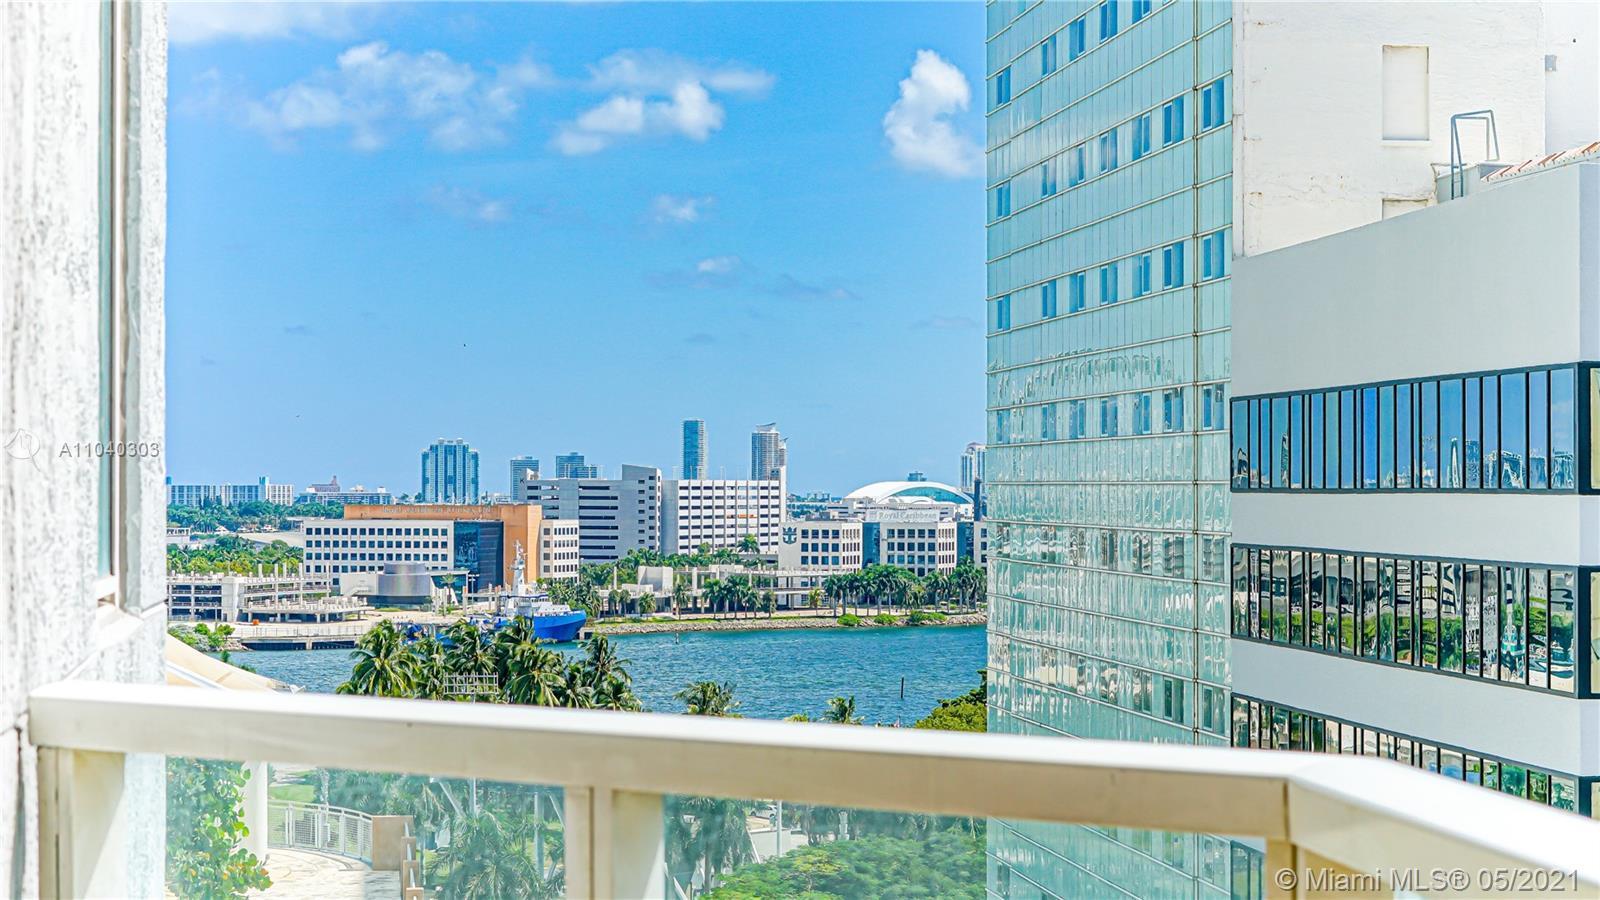 Vizcayne Two #1010 - 253 NE 2 ST #1010, Miami, FL 33132